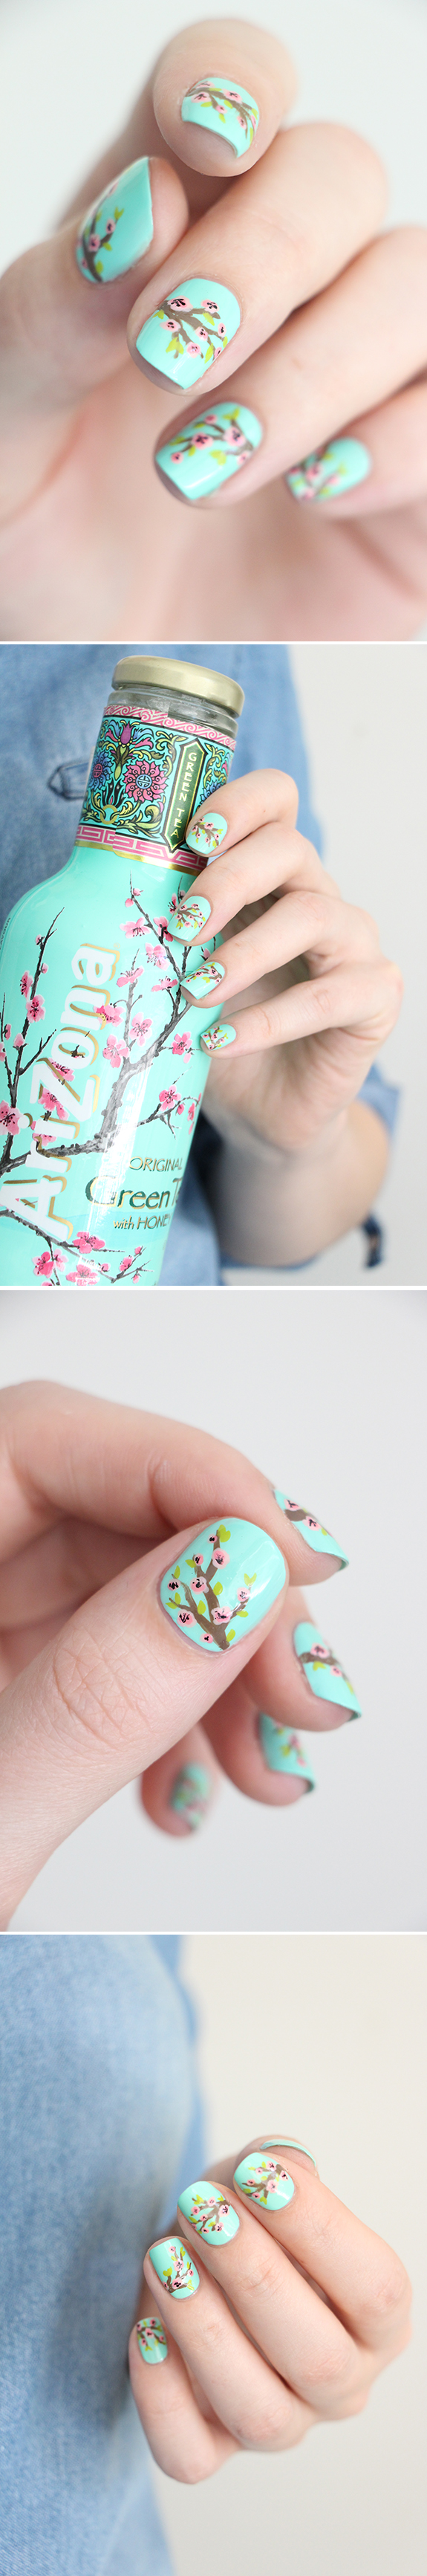 blossom-nails-3